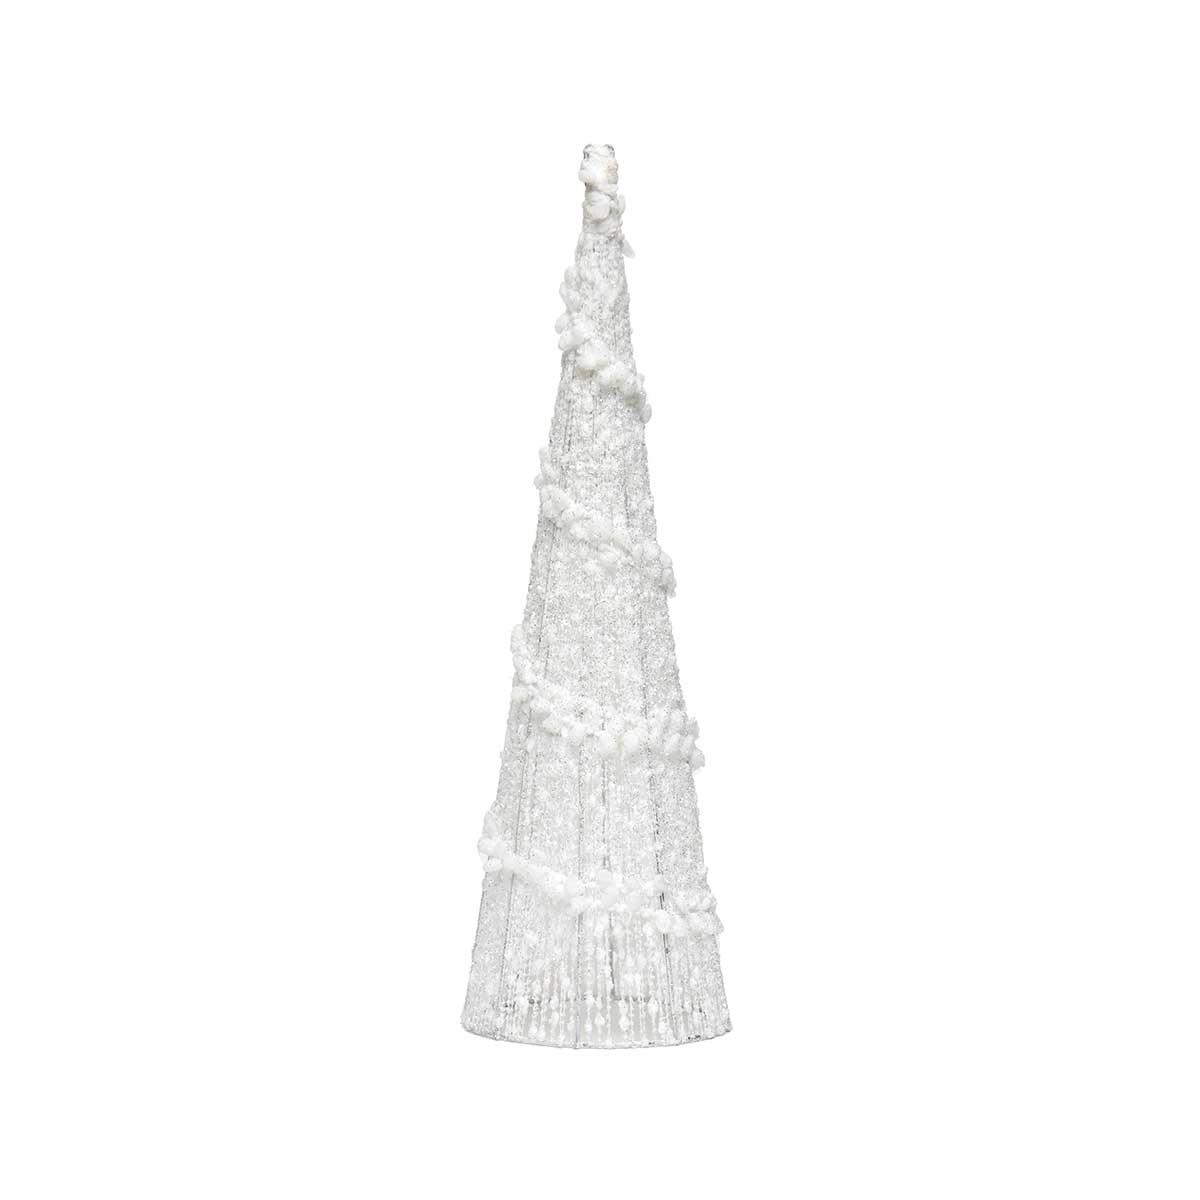 WHITE PUFF BALL CONE TREE